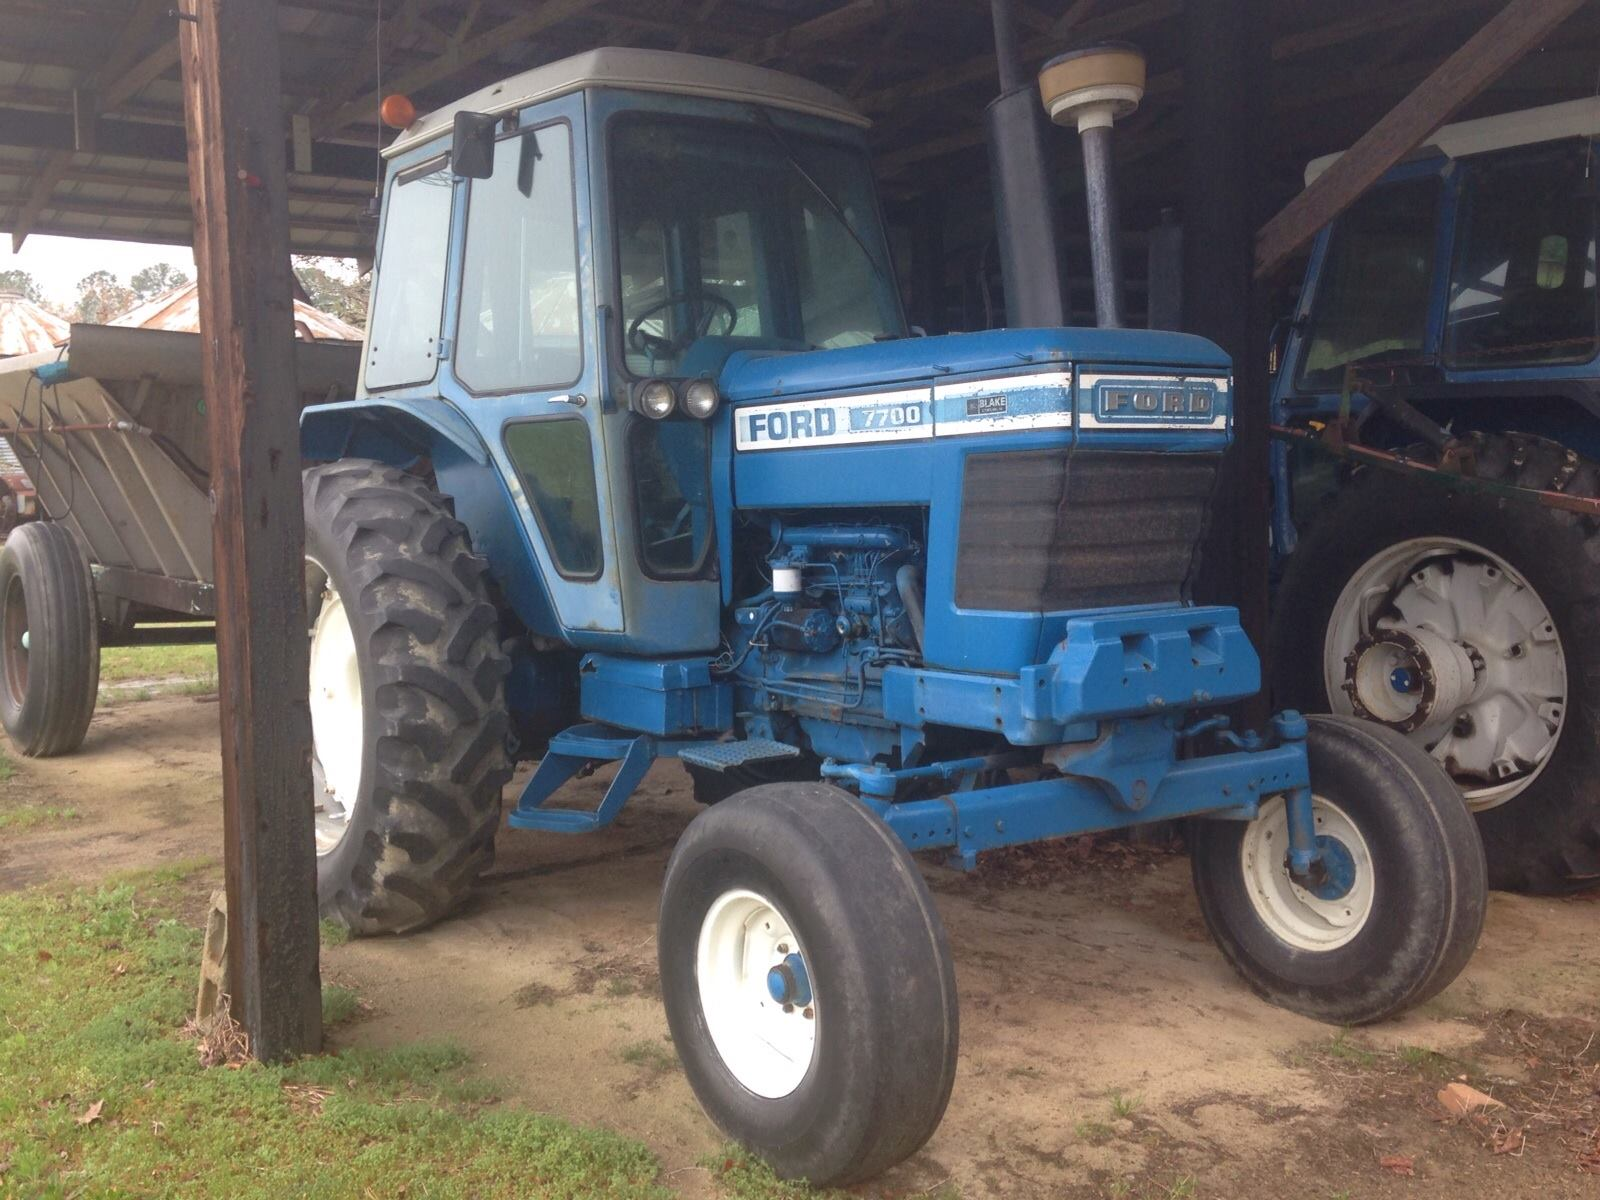 Ford 7700 Farm Tractor Tractors 7740 Wiring Harness Kits Petes Pick Of The Week News Agwebcom